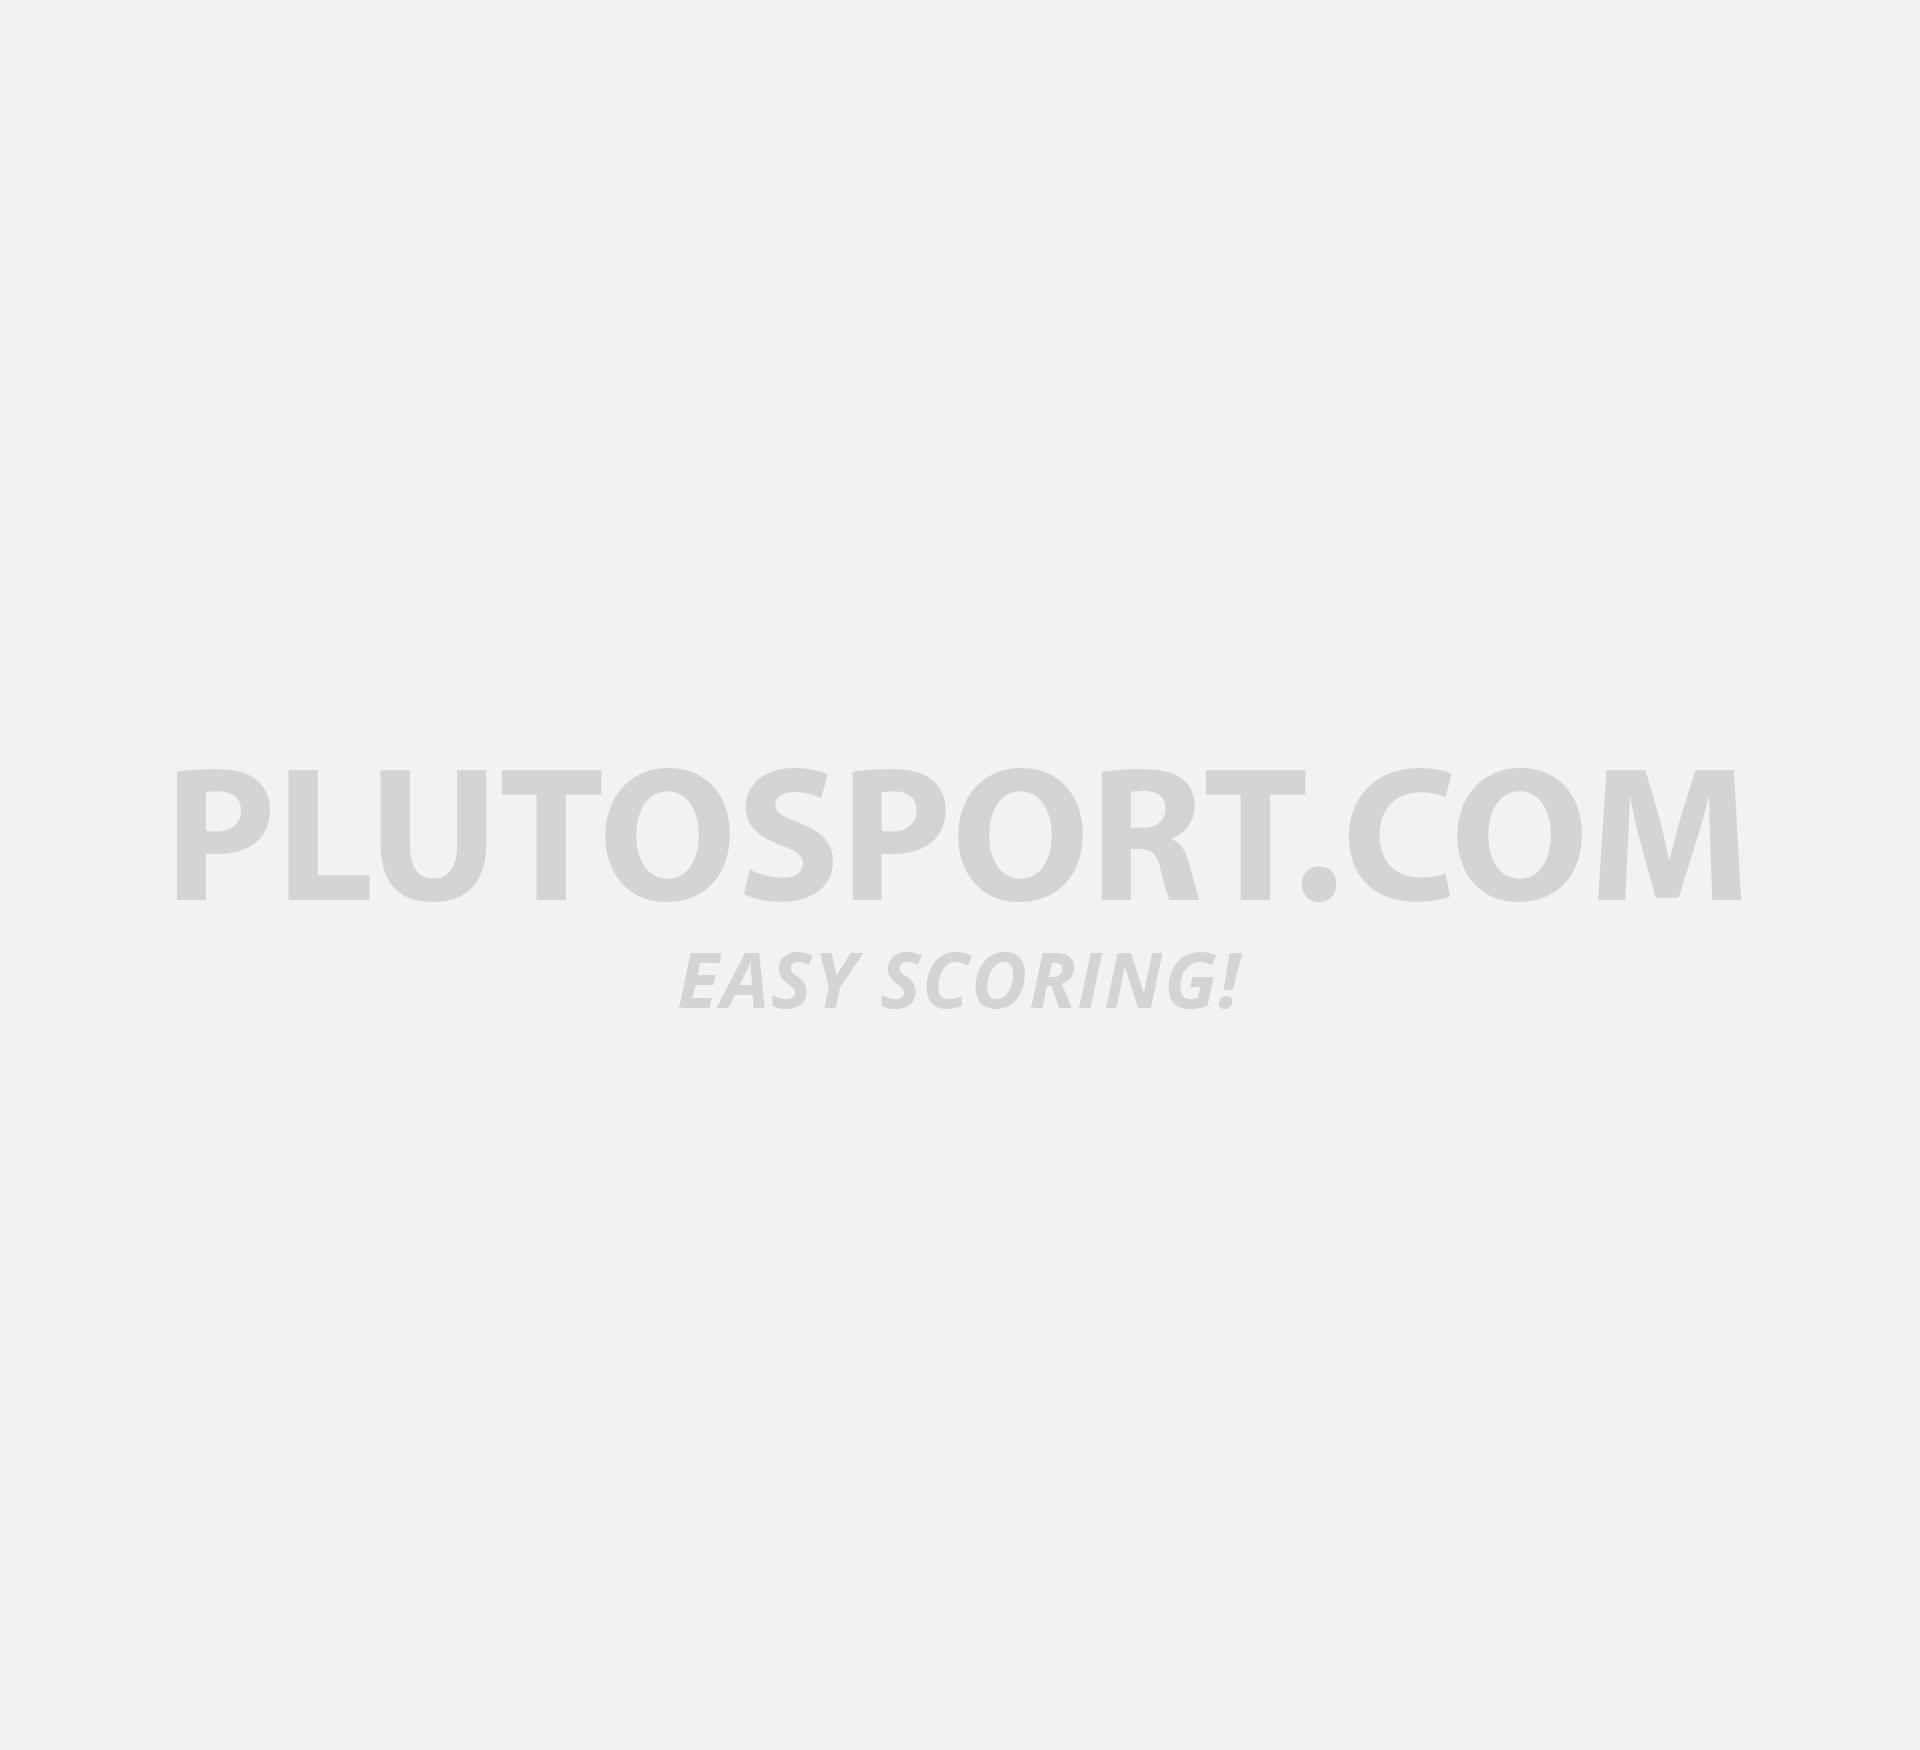 85c8f12a5 Nike Pro Combat Hyperwarm Compression LS Shirt Men - Shirts - Compression  clothing - Clothing - Football - Sports | Plutosport